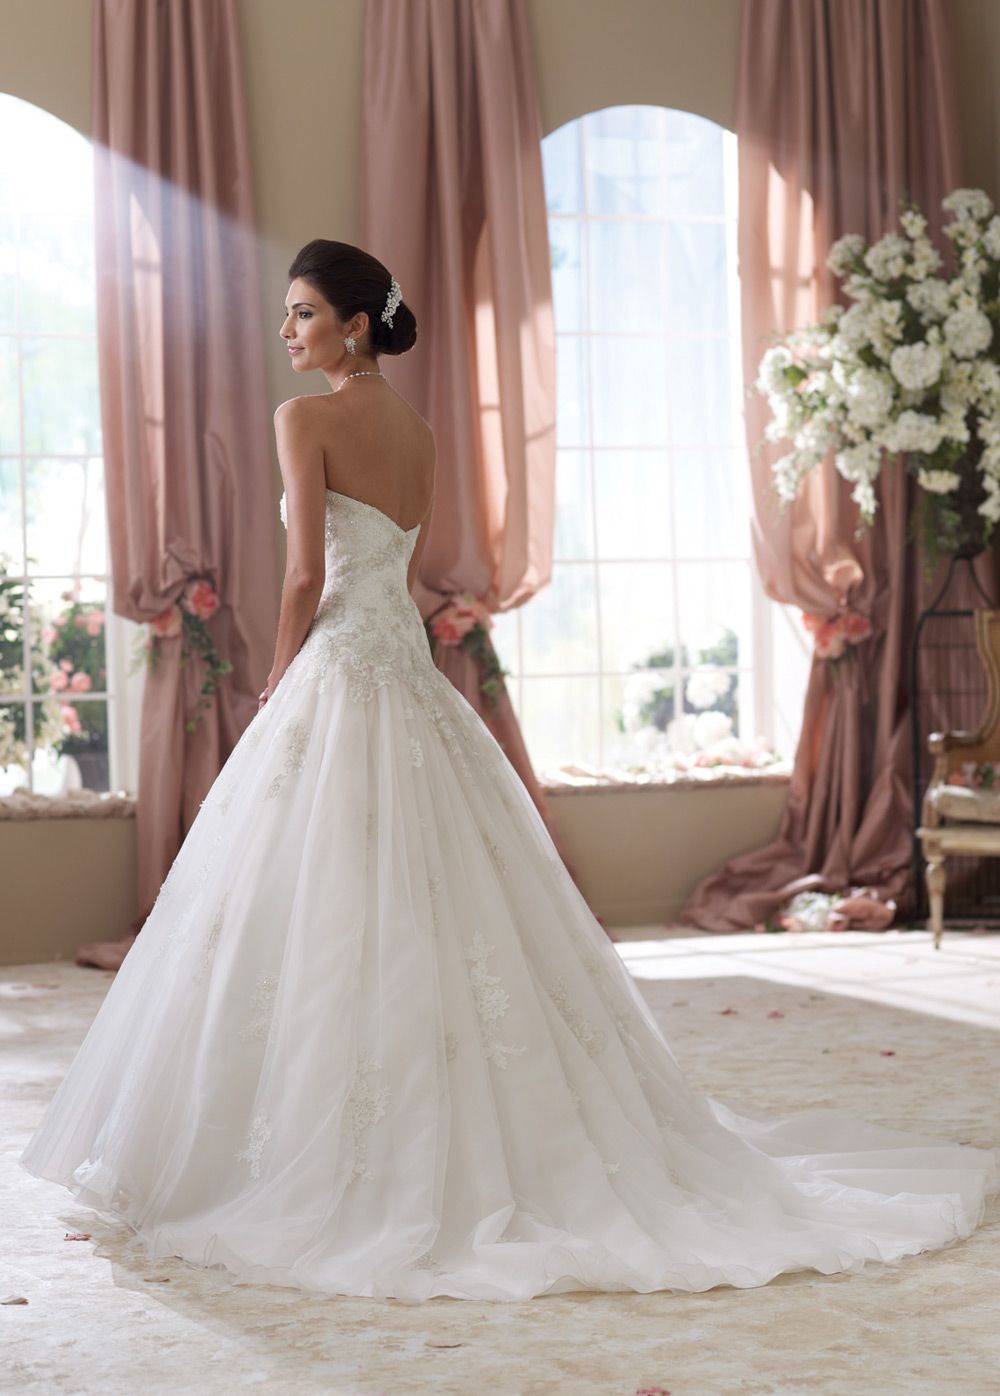 Vestido de novia con velo o sin velo